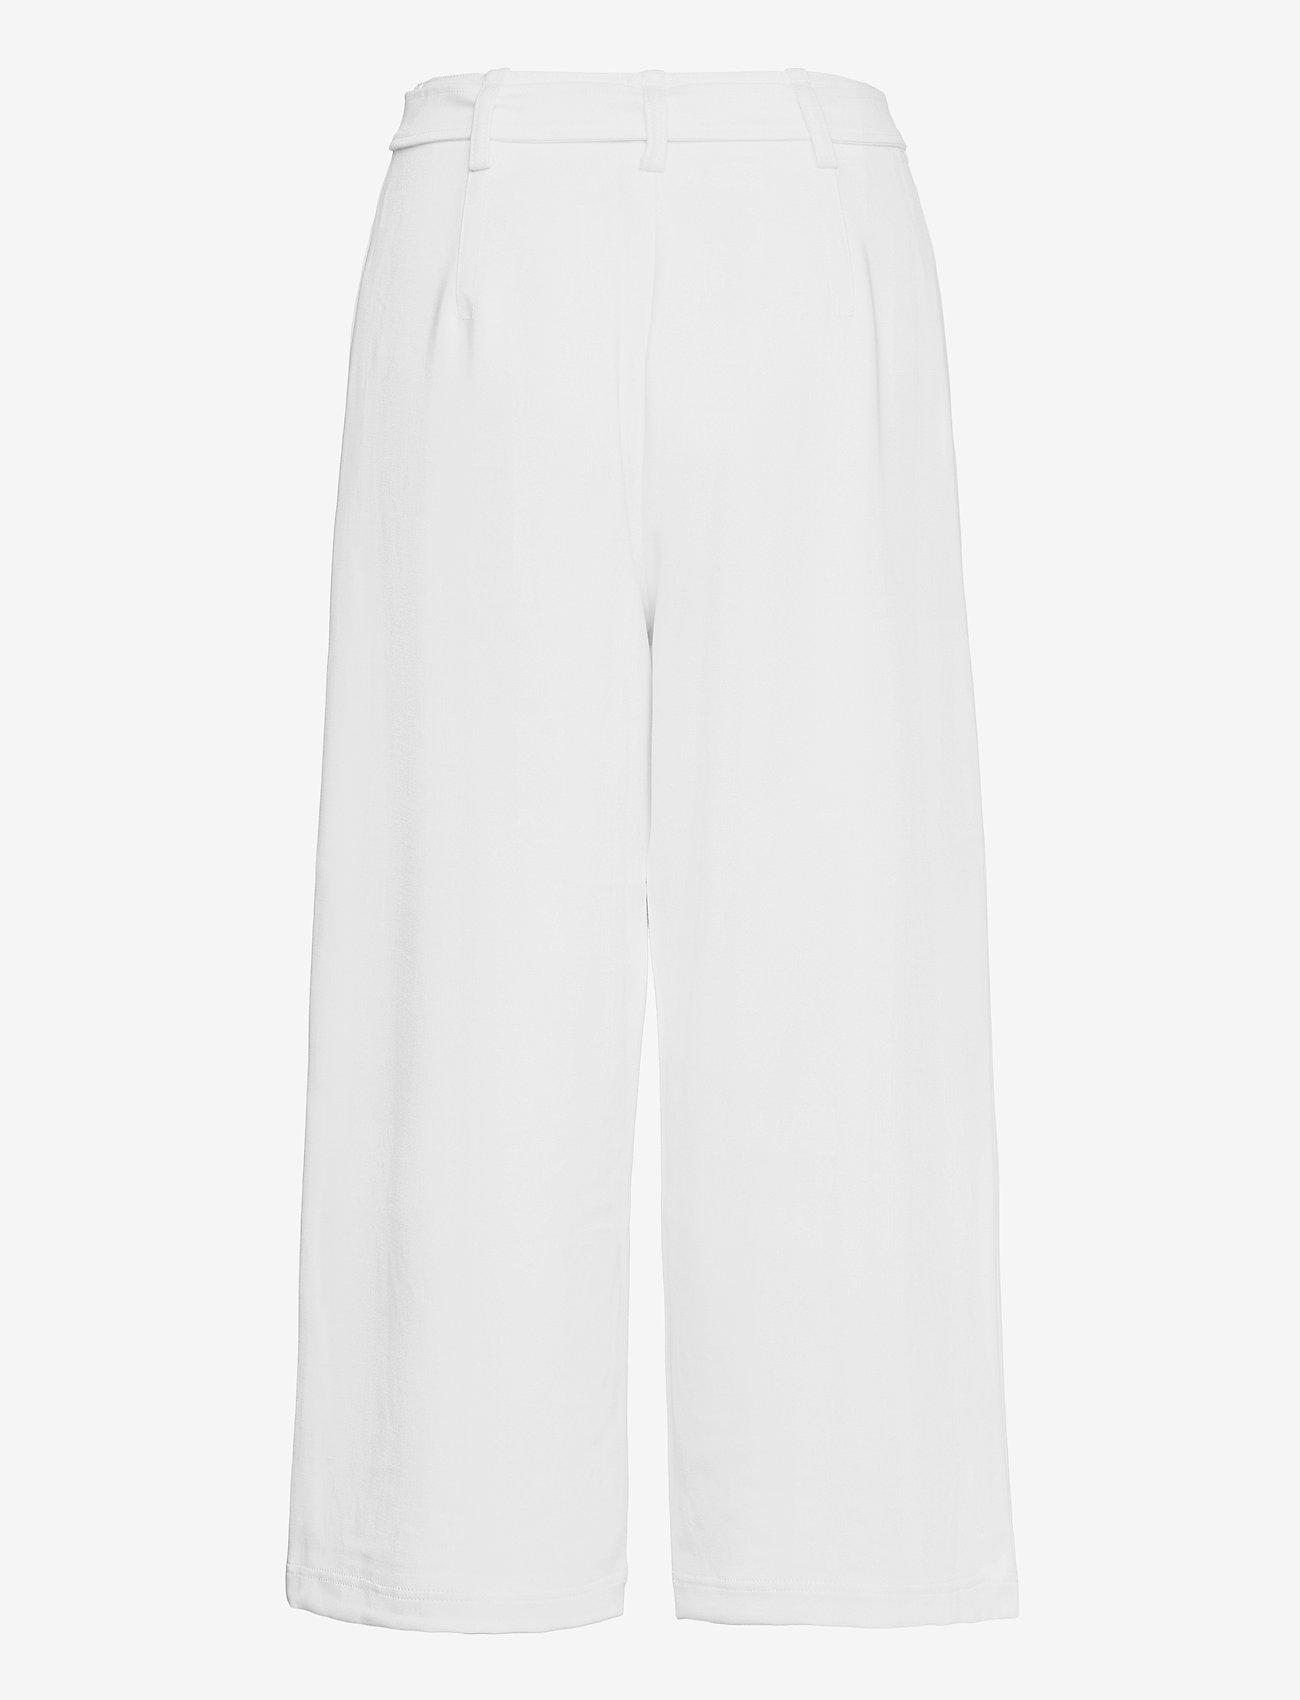 French Connection - INDI WHISPER RUTH STNG CULOTTS - bukser med brede ben - summer white - 1